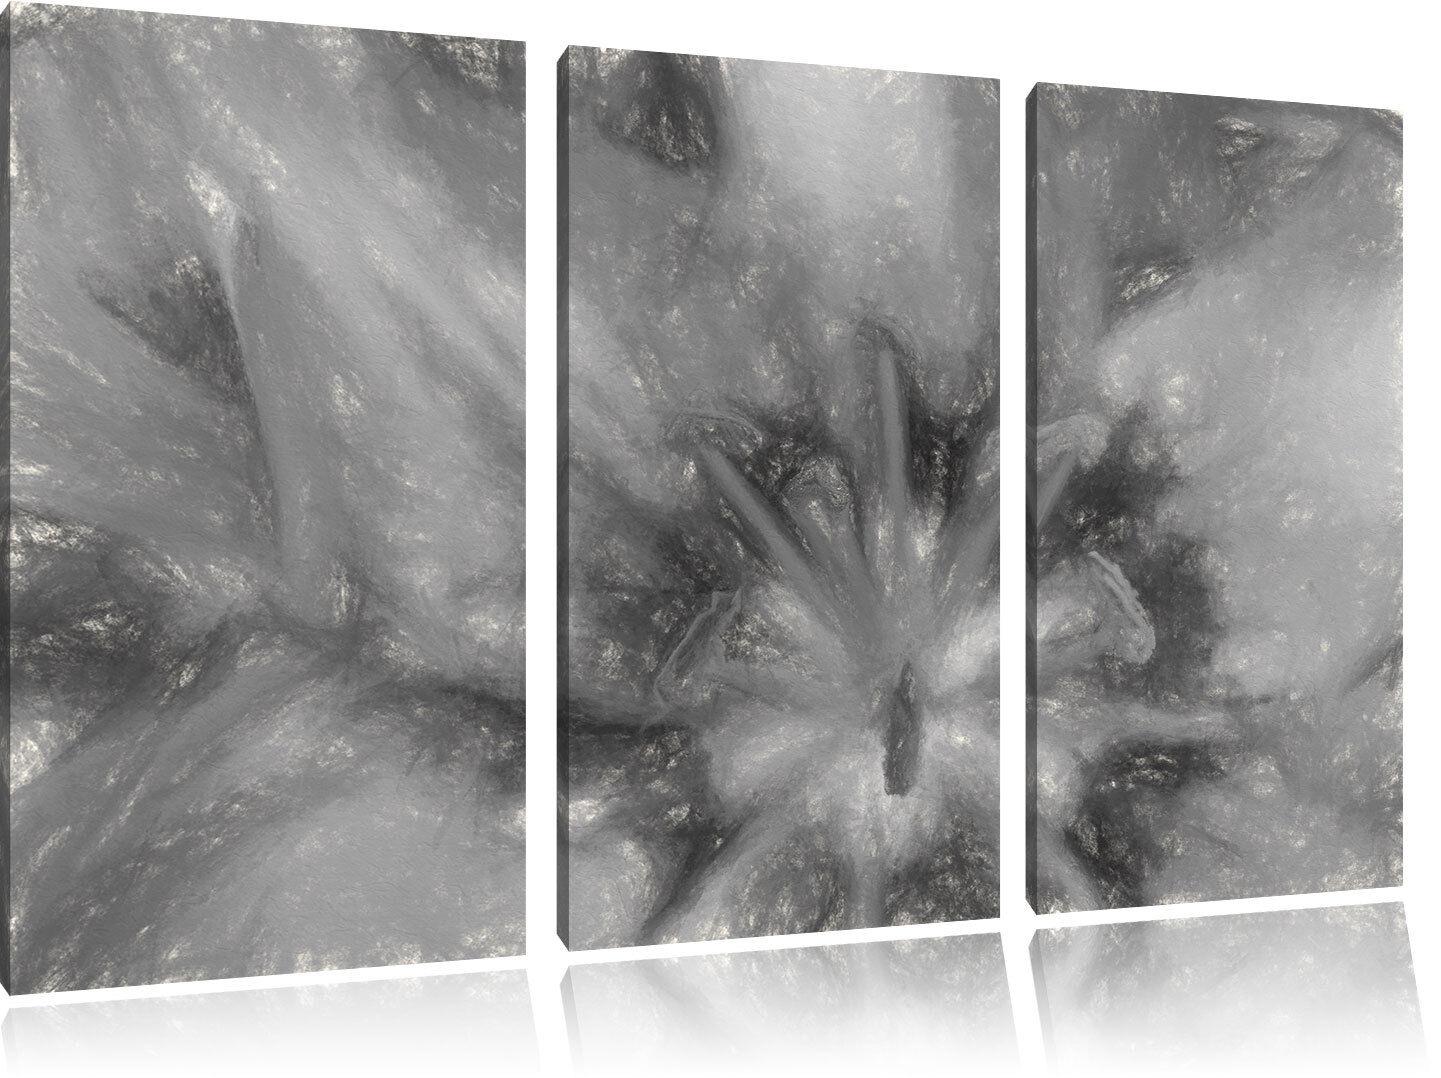 Hermoso Lirio Primer Plano Arte Arte Arte Carbón Efecto 3-Teiler Foto en Lienzo 42d85b